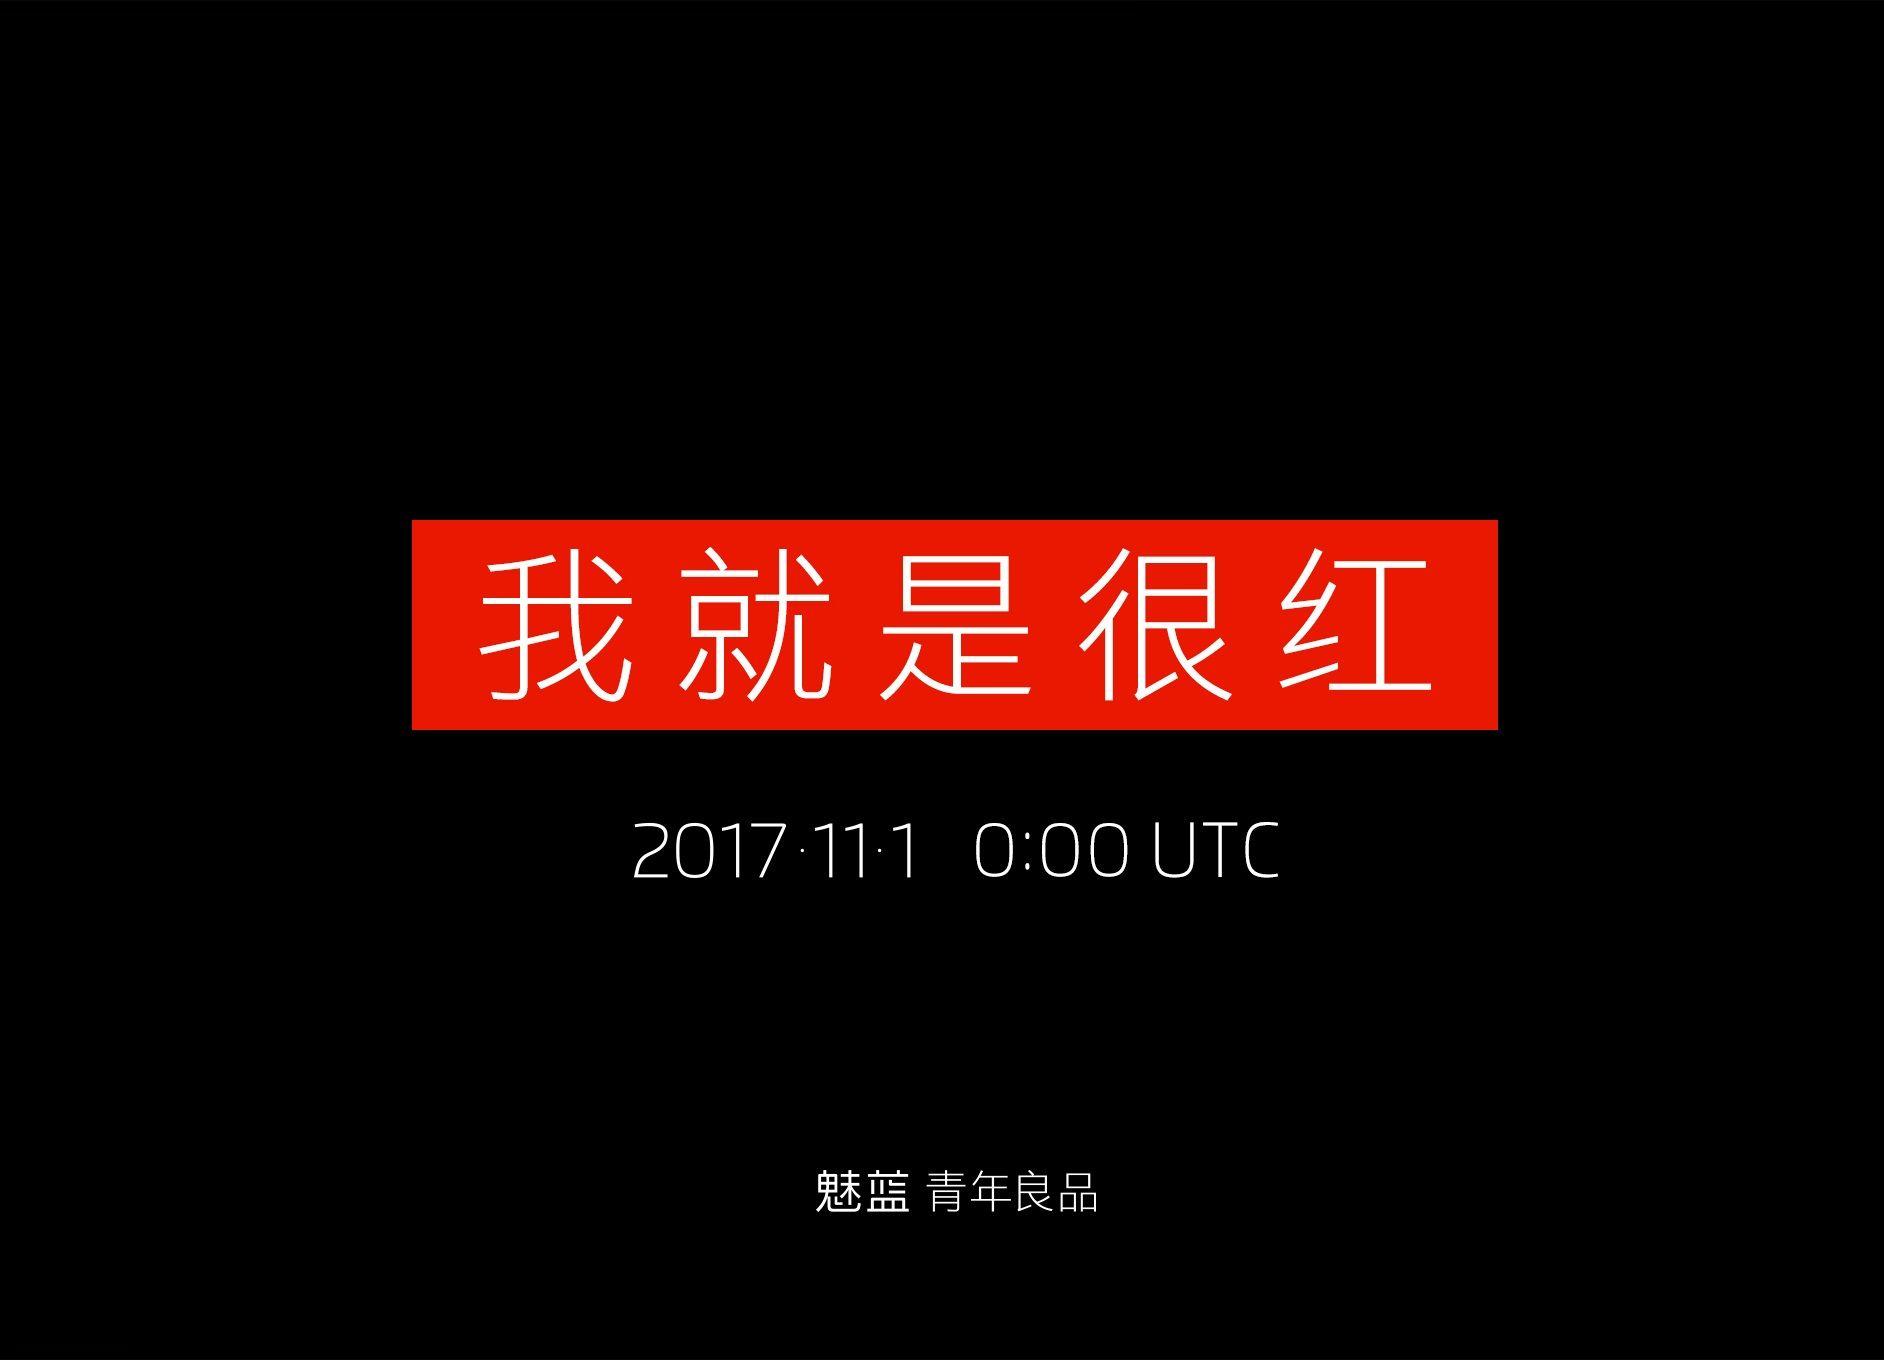 Meizu M6 Noteの猩焔紅(レッド)を11月1日に発表へ。ティザー画像を公式サイトに掲示